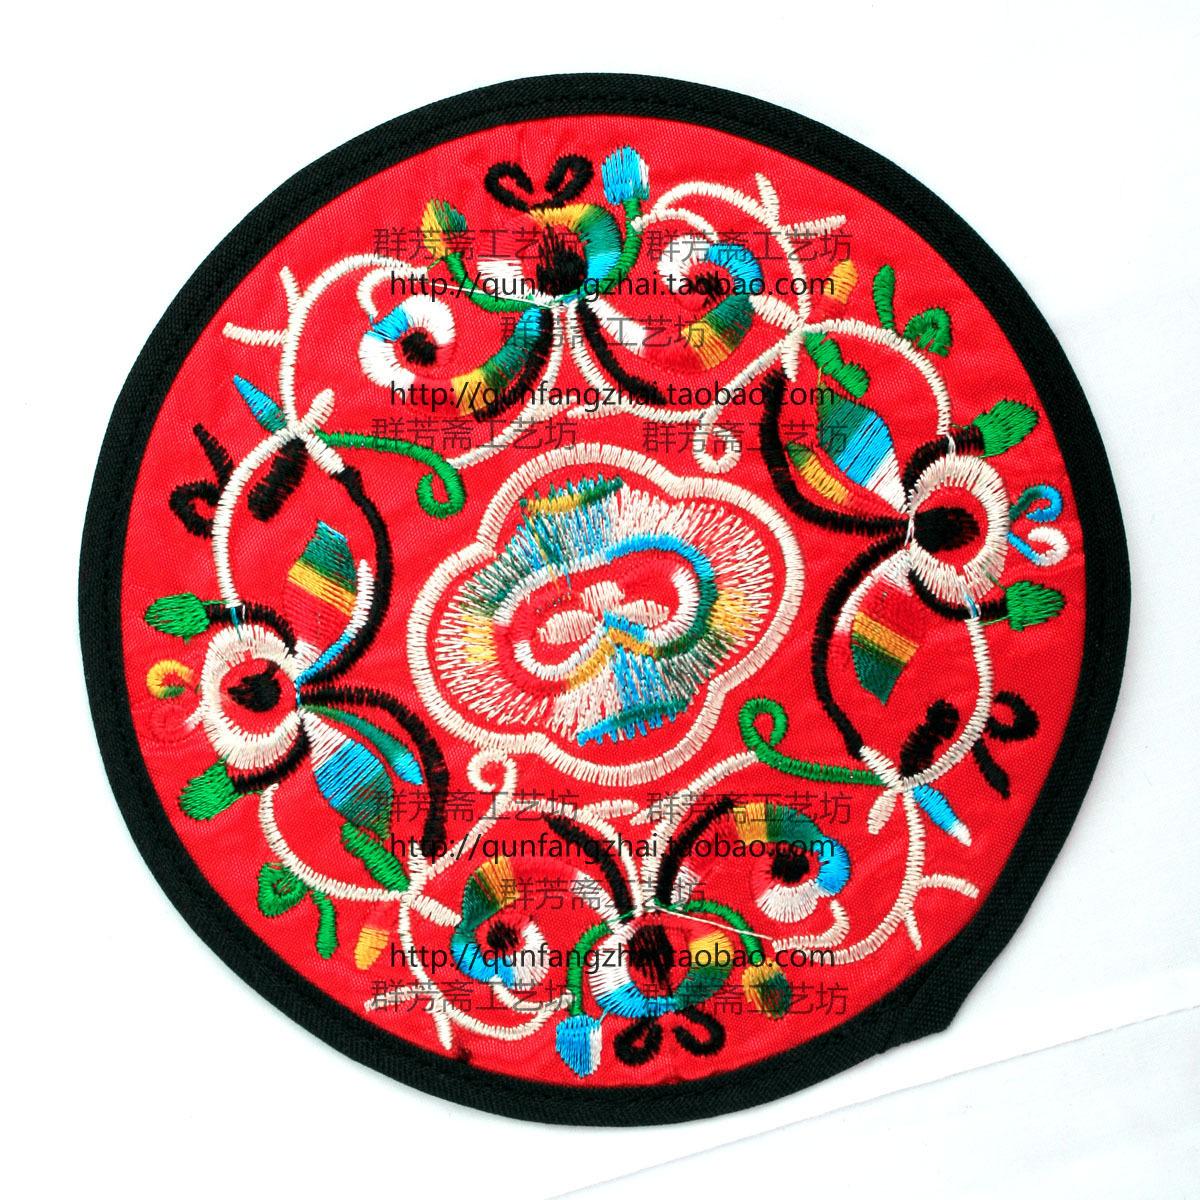 Chinese Style Coasters - Aliexpress.com -의 China Love&Life Art에서 Chinese Style ...